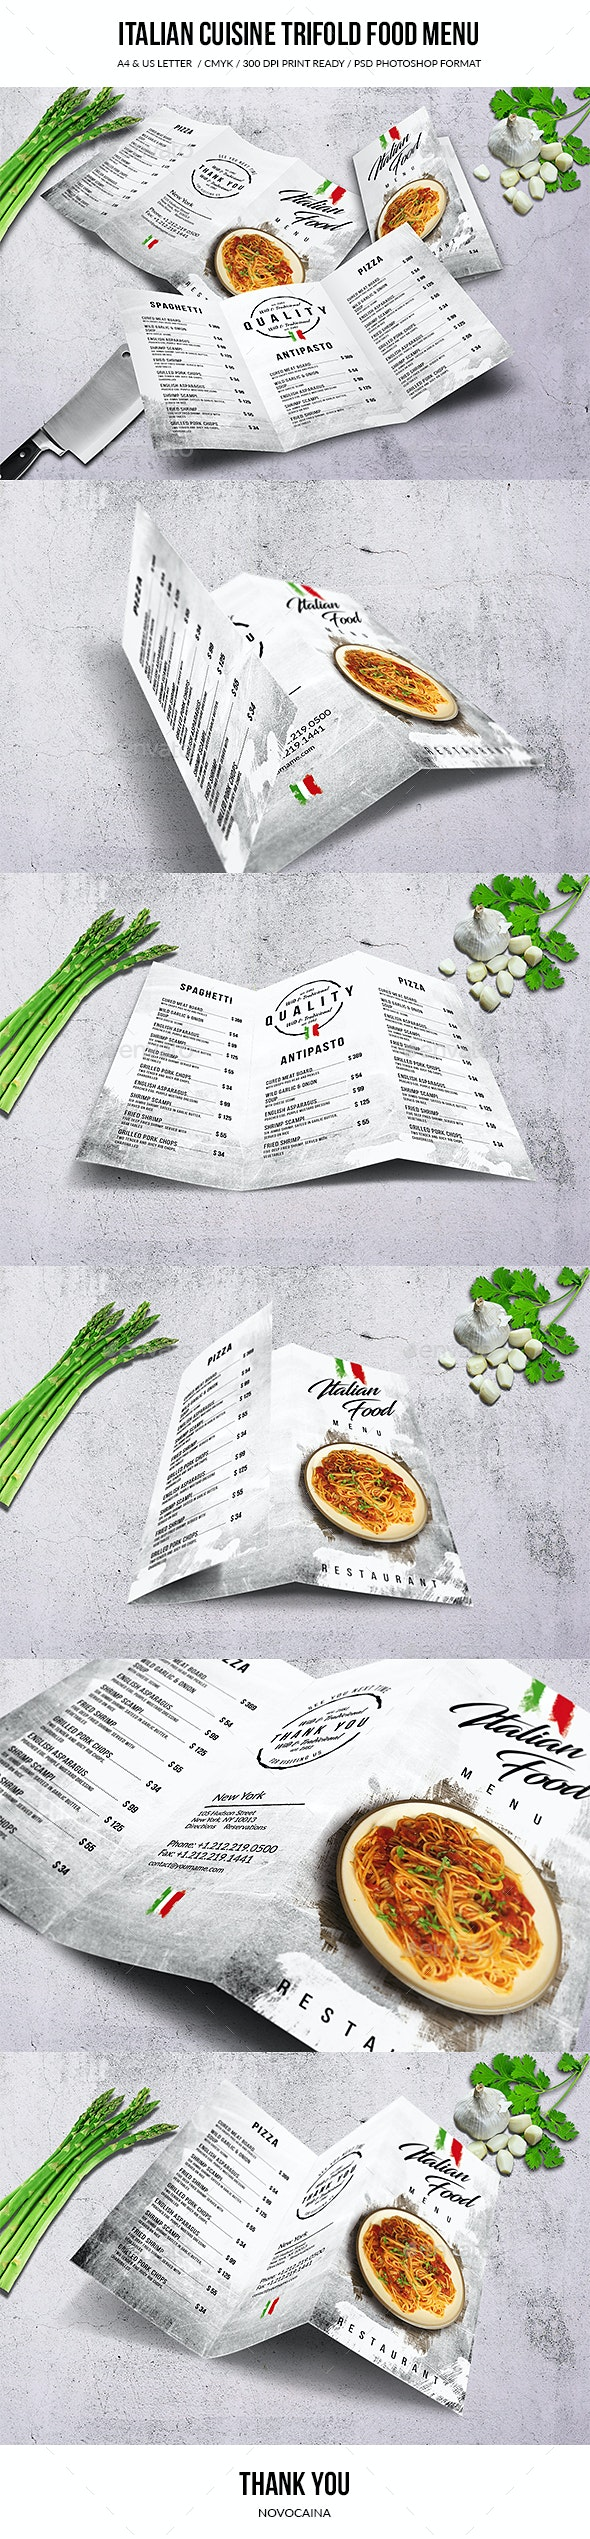 Italian Cuisine A4 & US Letter Trifold Menu - Food Menus Print Templates